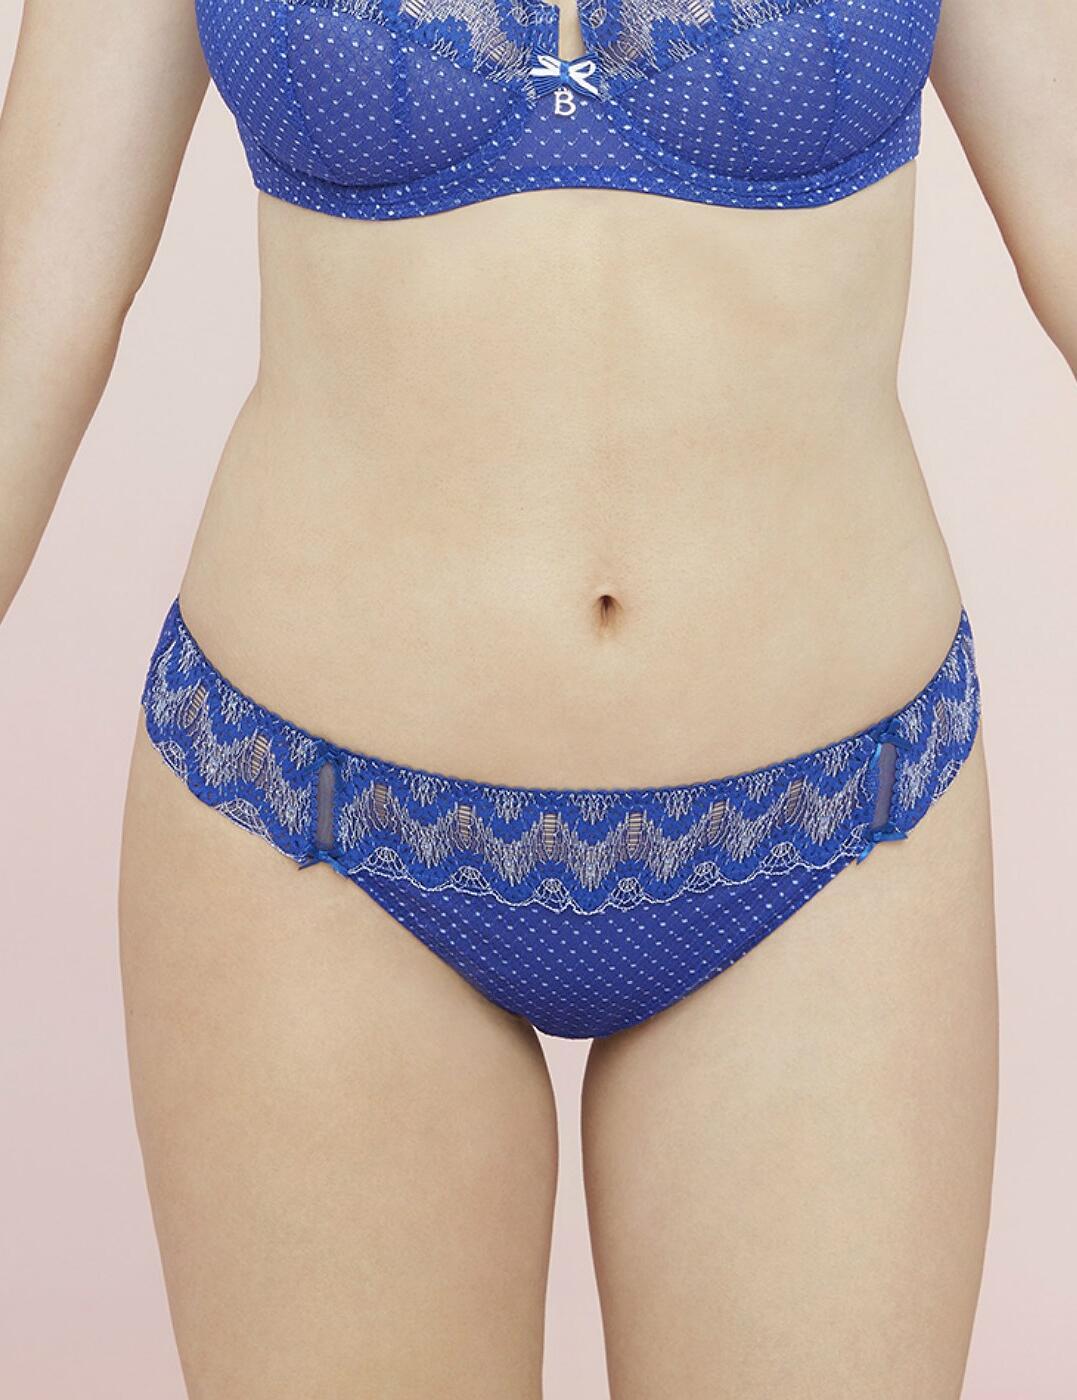 Bestform Seville Short Brief 07461 New Lingerie Womens Knickers Blue